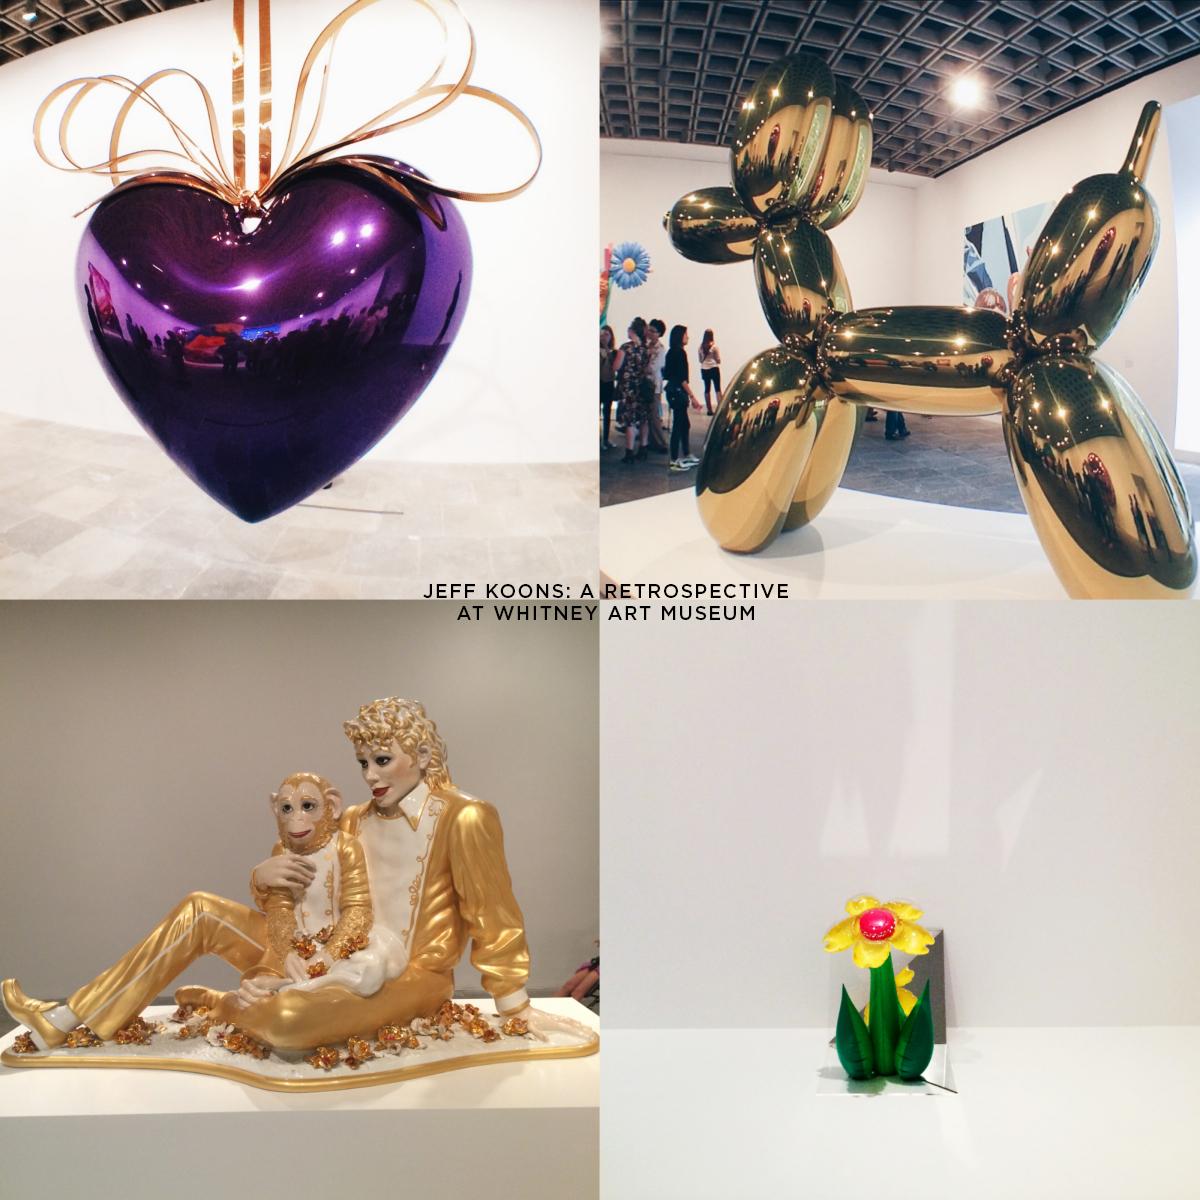 jeff-koons-retrospective-whitney-art-museum-nyc.jpg